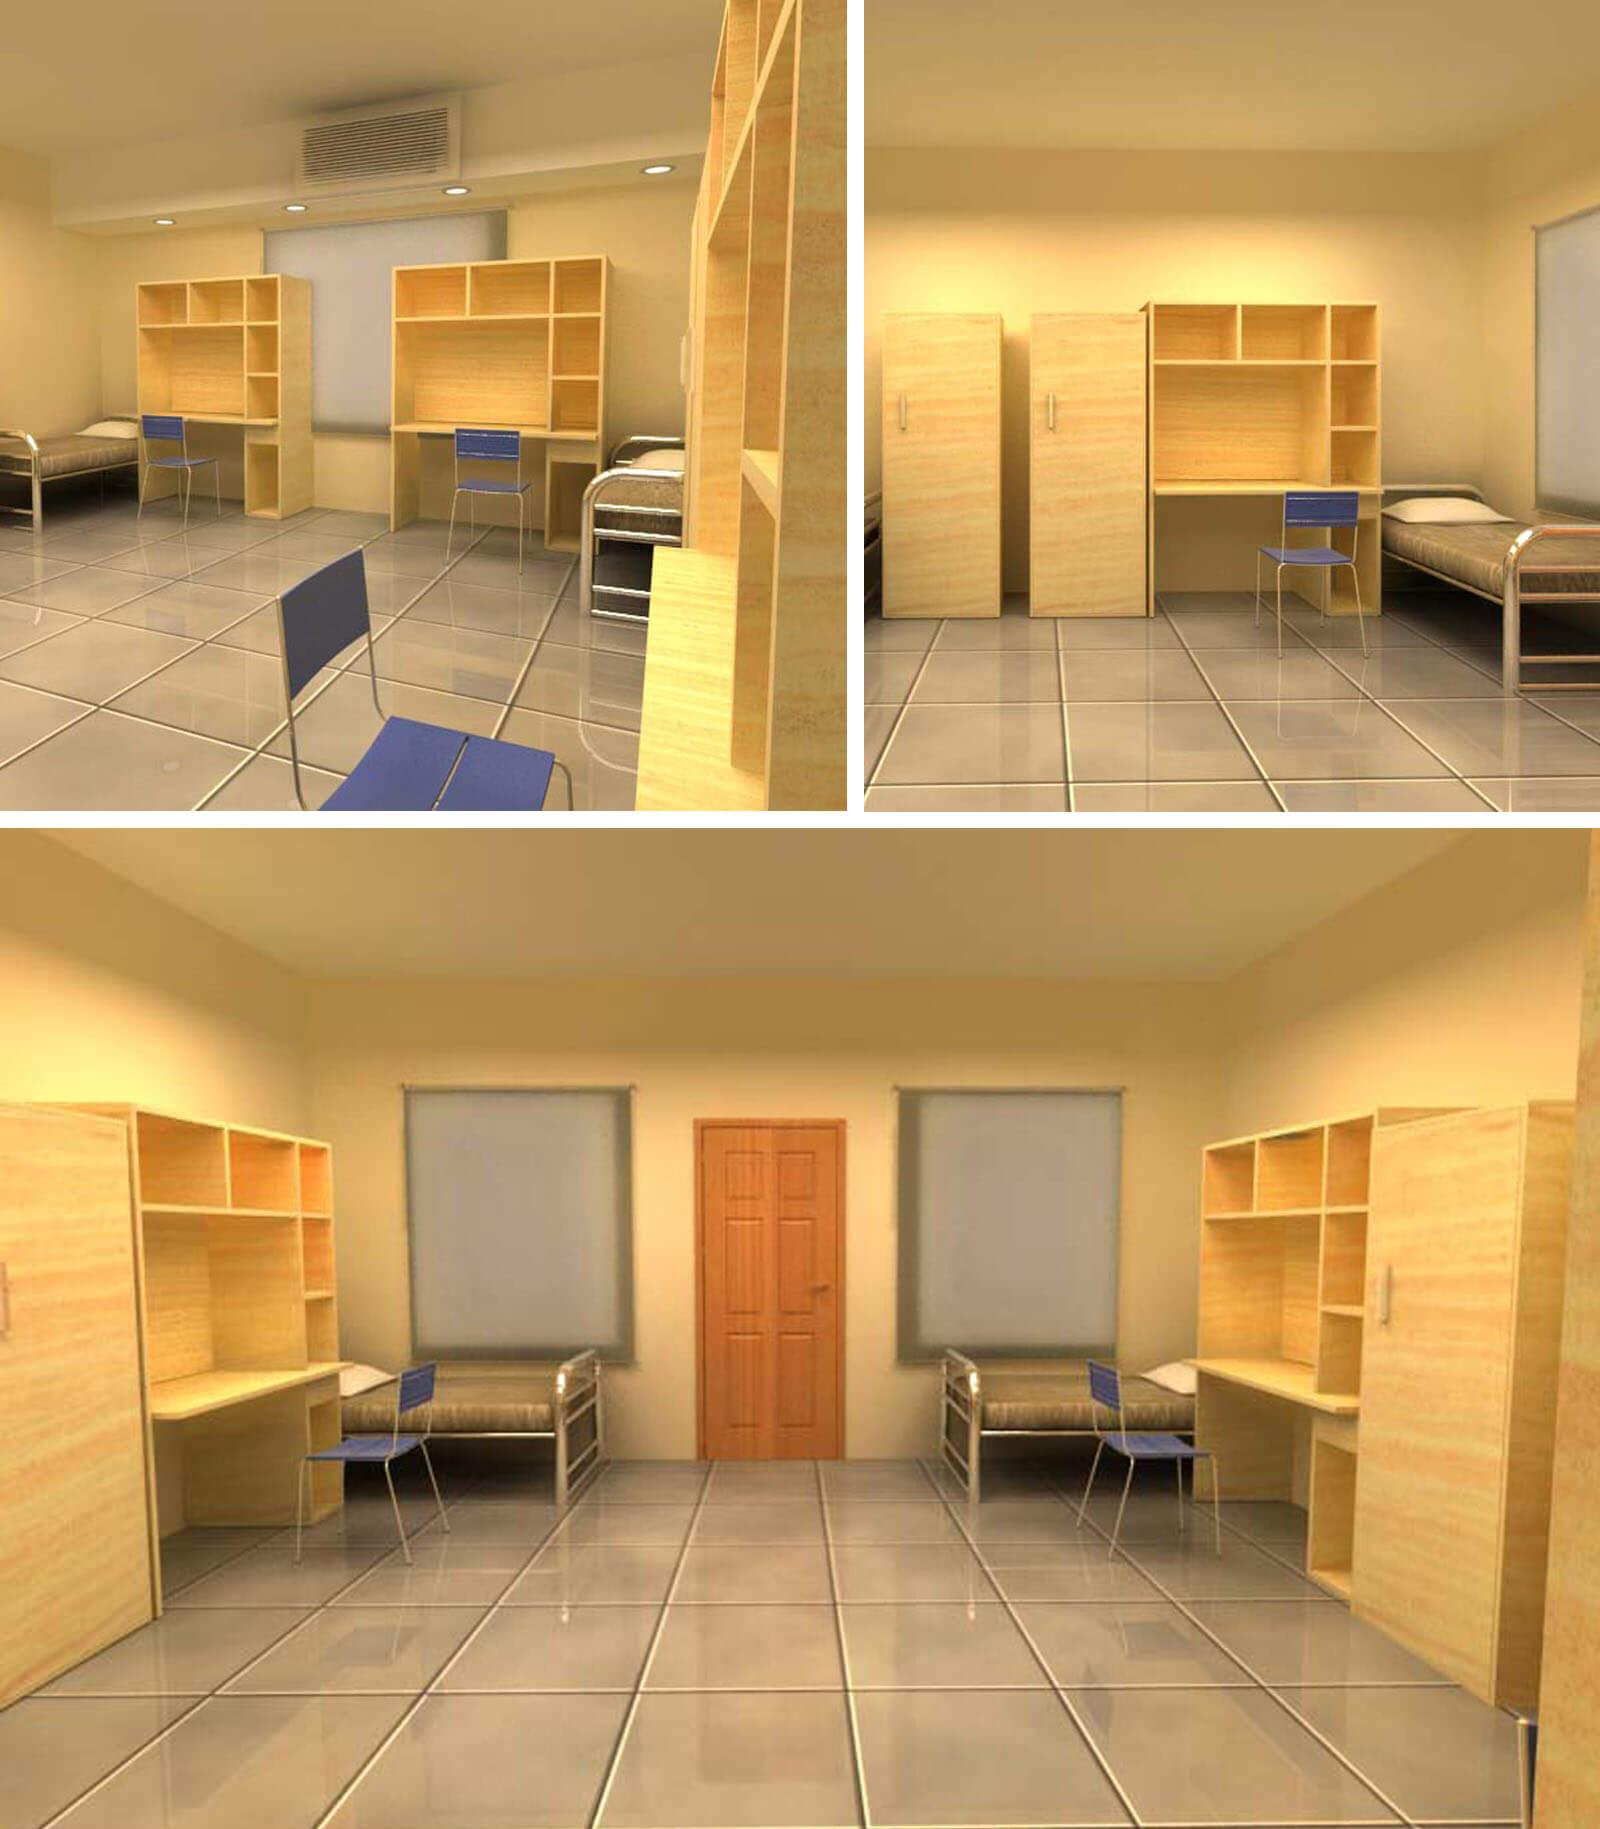 DTC-Interior-Exterior-Project-Pledge-Harbor2016